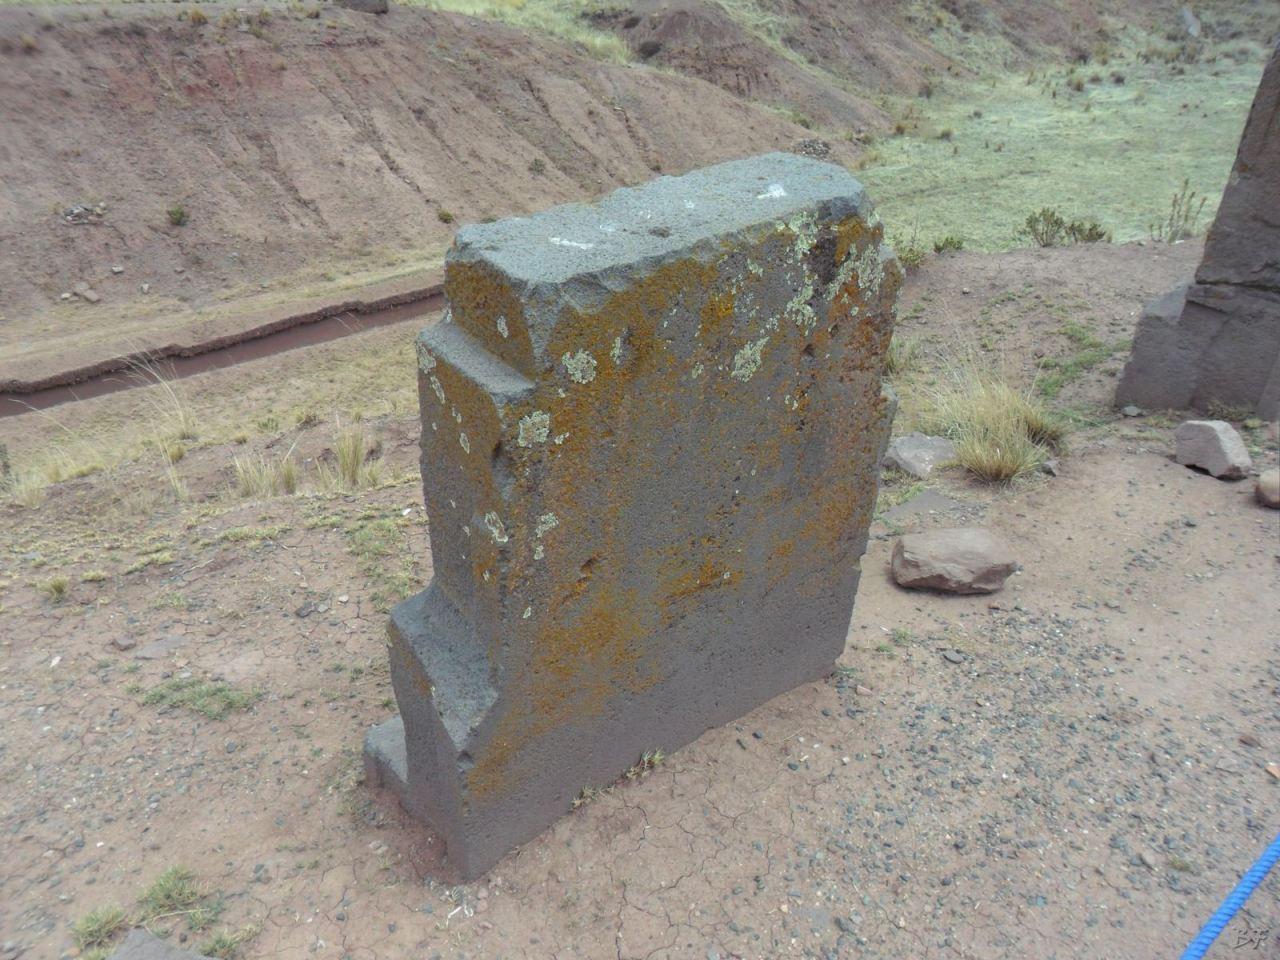 Sito-Megalitico-Piramide-Akapana-Kalasasaya-Menhir-Tiahuanaco-Bolivia-115